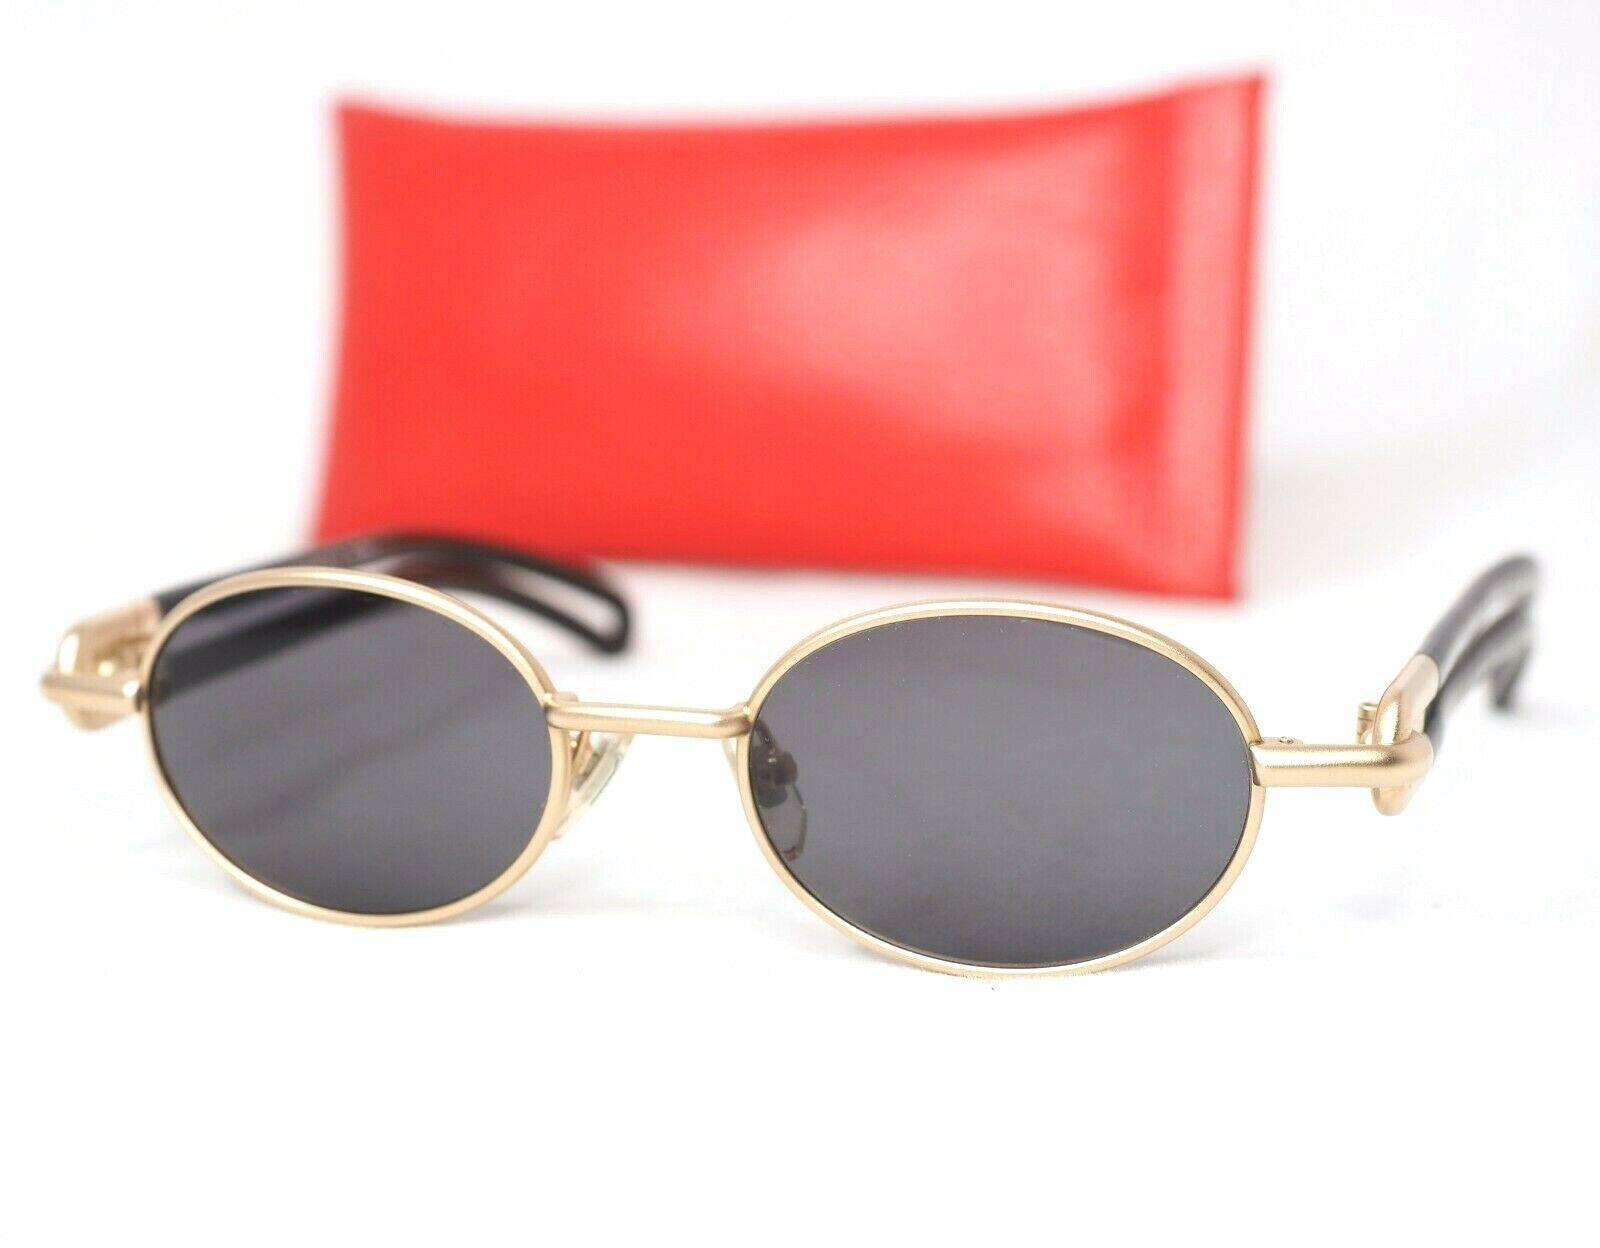 Yohji Yohji Yohji Yamamoto 52-7201 Sonnenbrille Satin Gold Schwarz Vintage Oval Japan Unisex | Günstigstes  | Neueste Technologie  | Hohe Qualität  025682